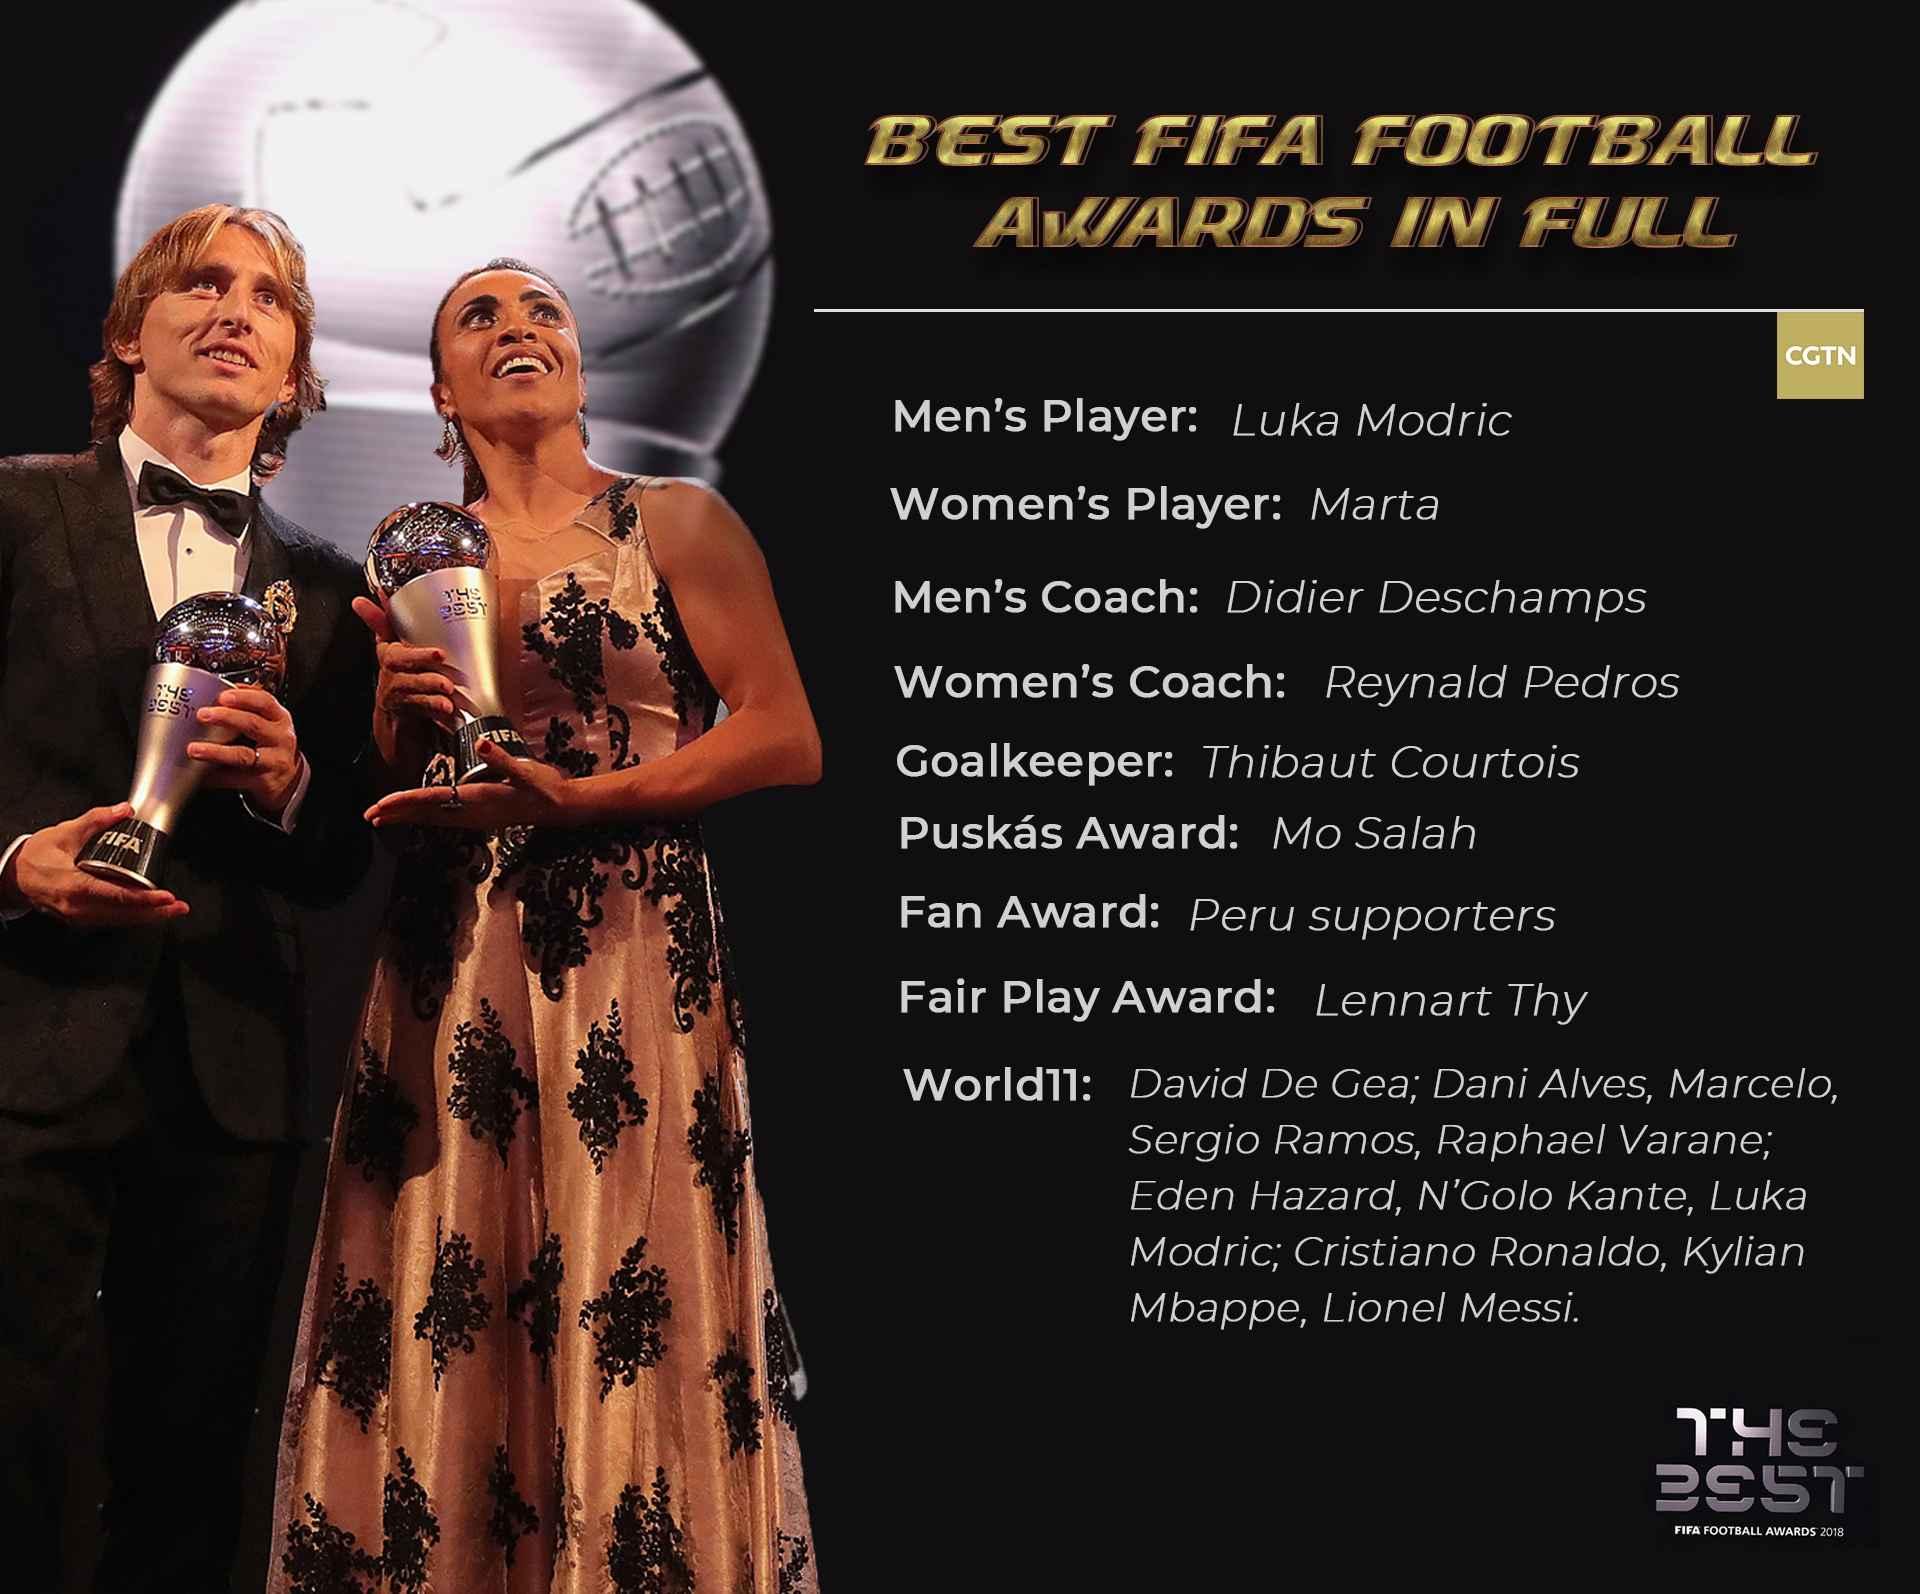 Luka Modric ends Ronaldo-Messi era to be crowned world's best